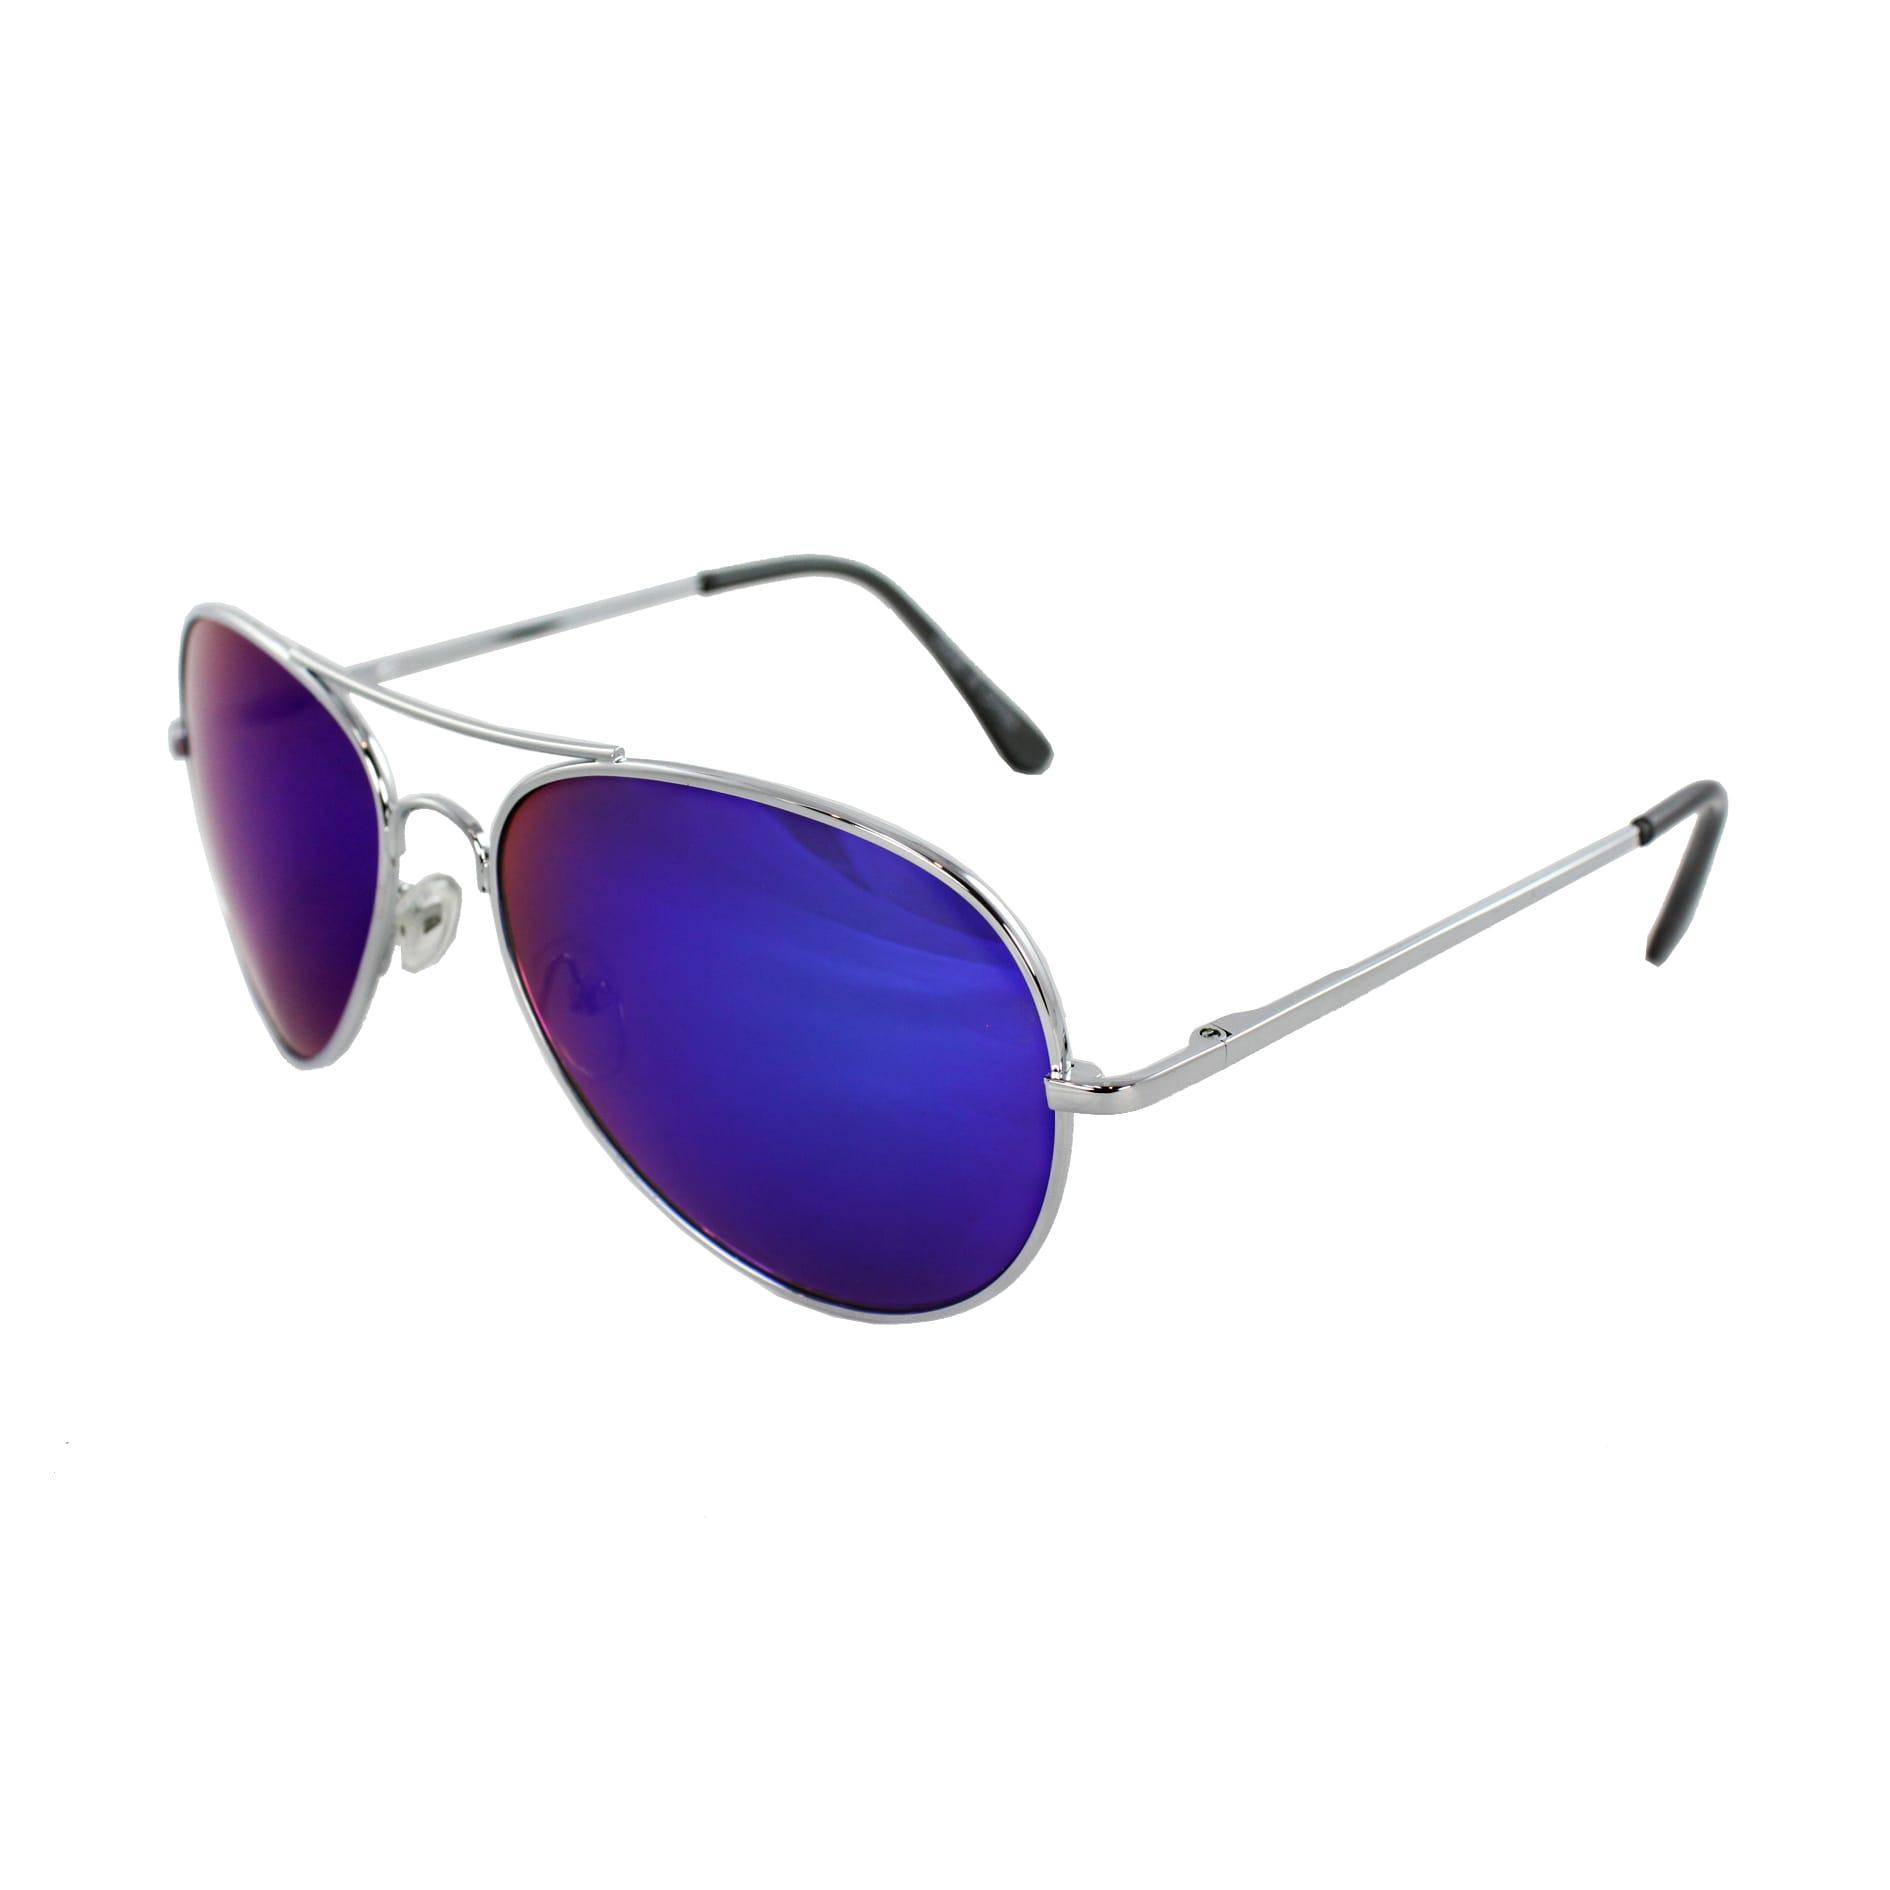 Aviator Sunglasses Blue Mirror  uni 30011r svrbugnmr metal blue mirror aviator sunglasses